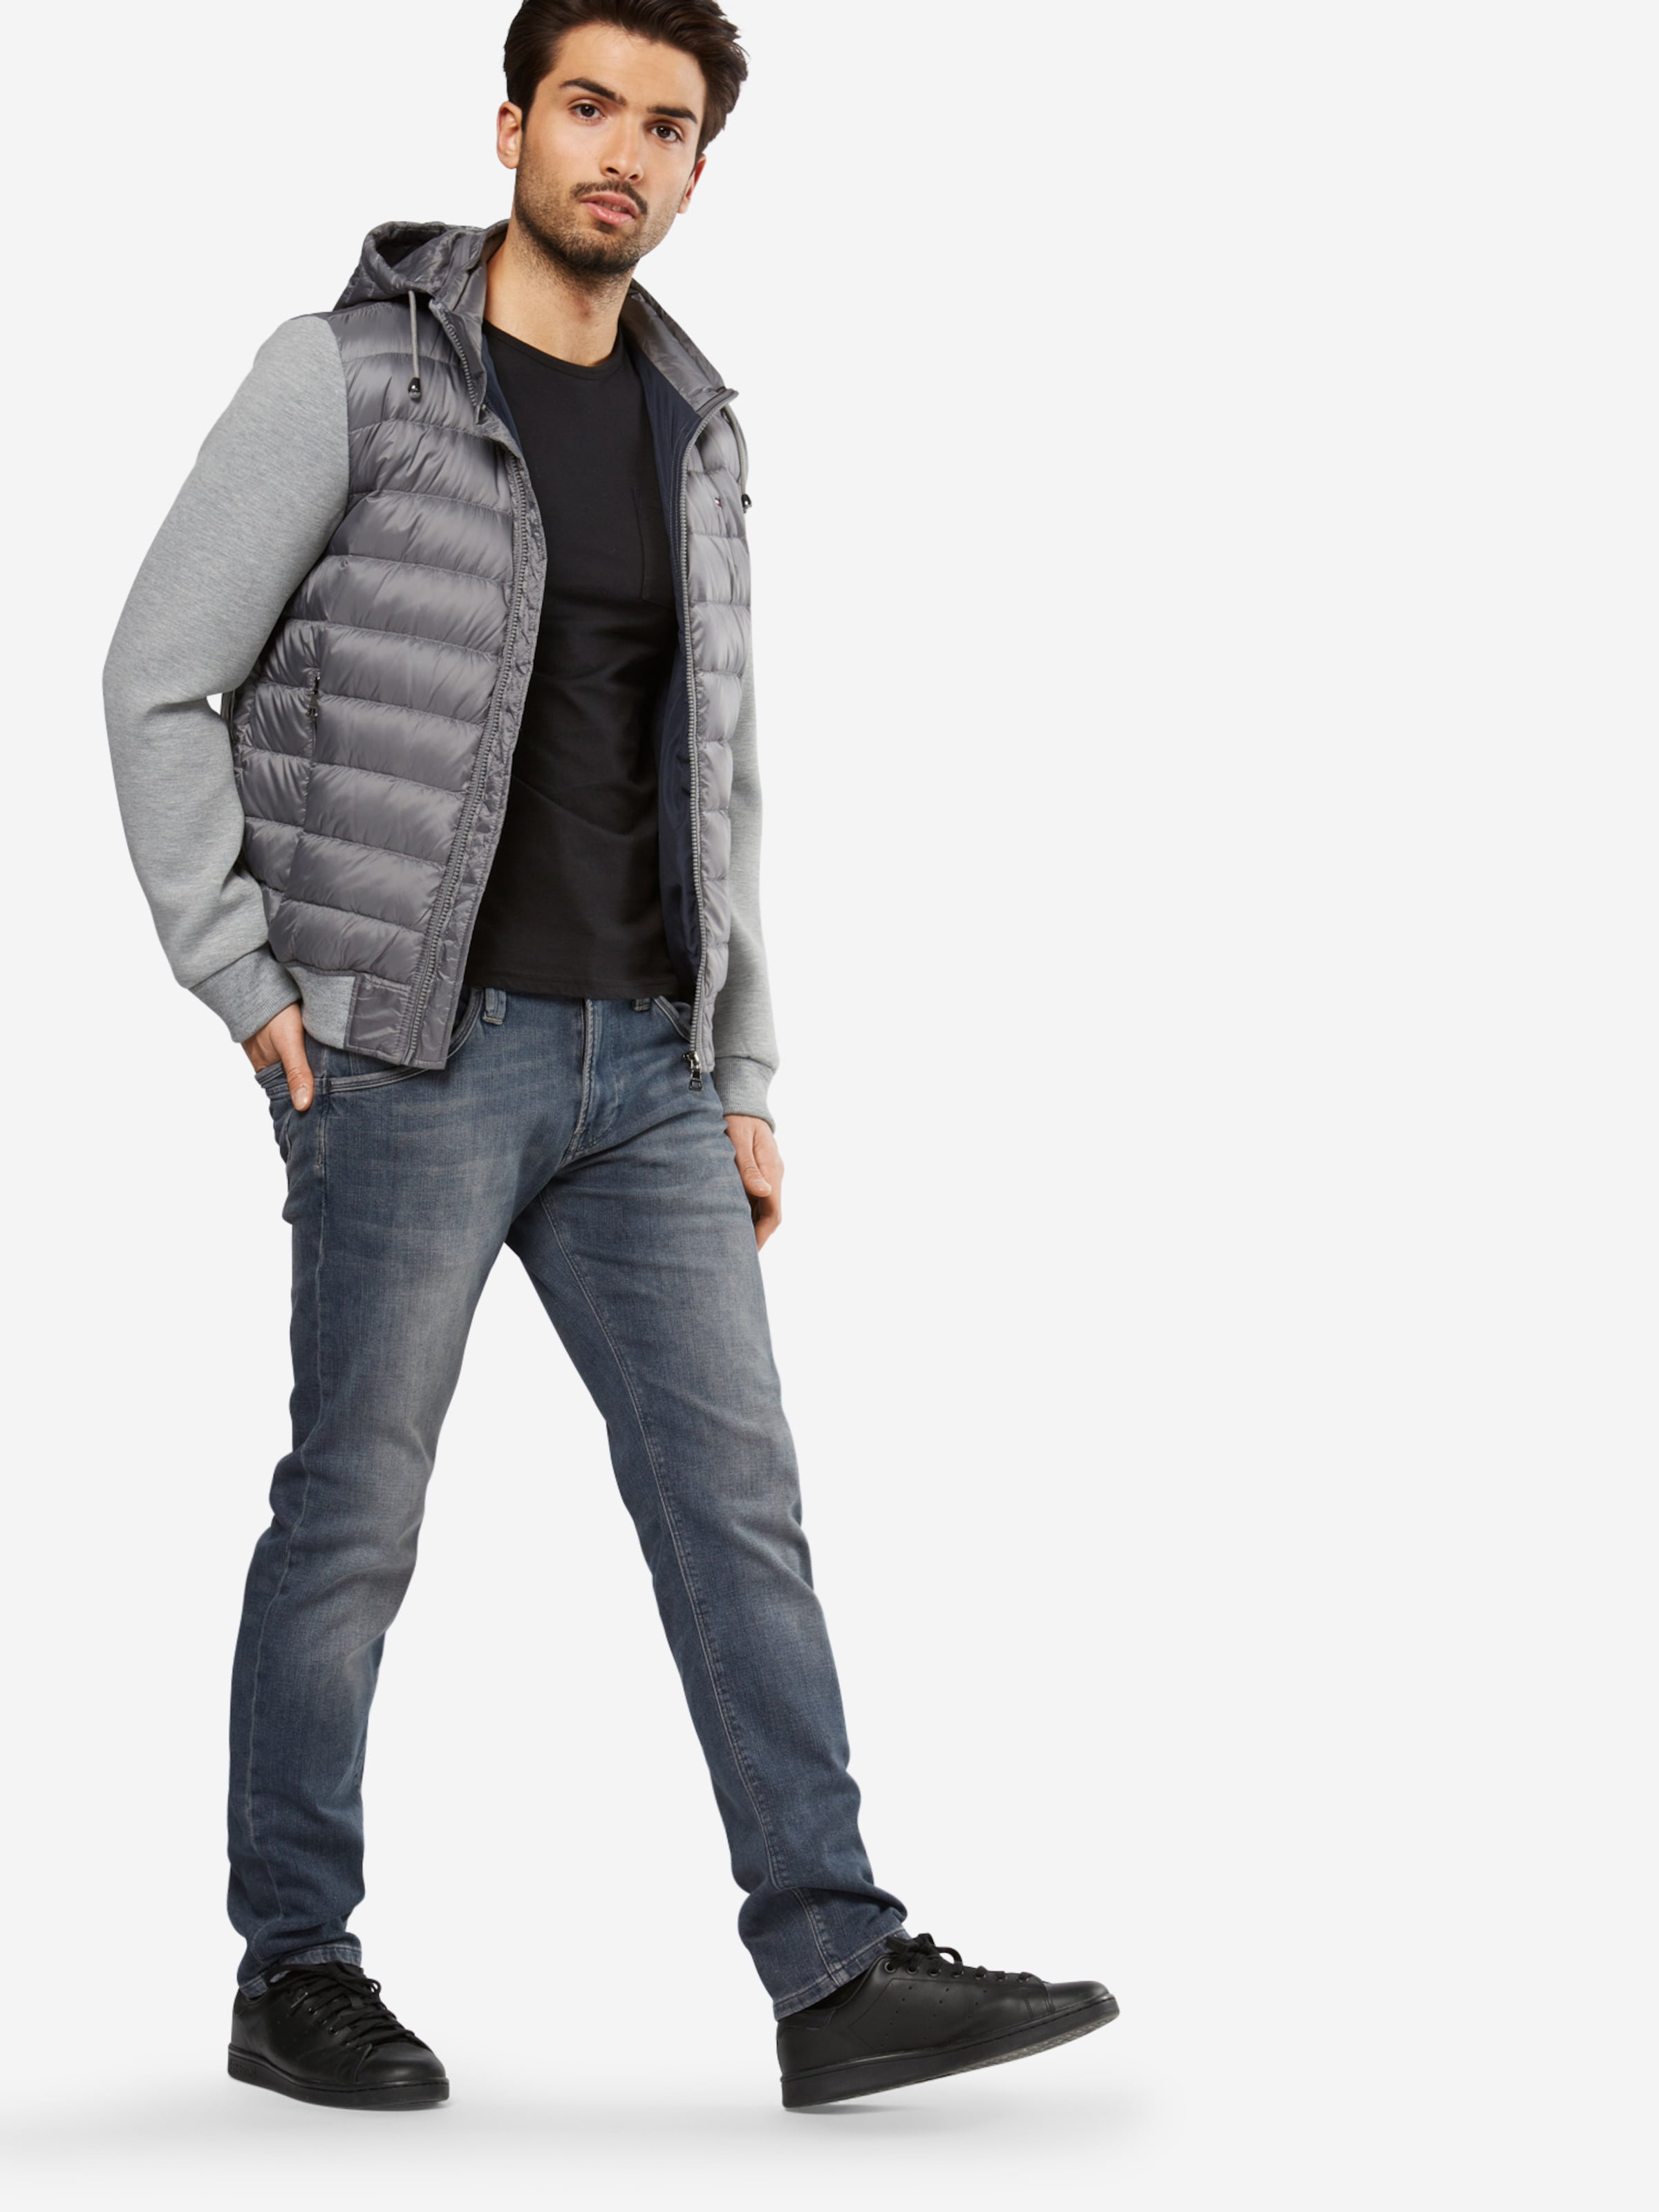 'Zinc' Pepe Jeans Jeans Pepe Slim Jeans Regular wU5YB6q